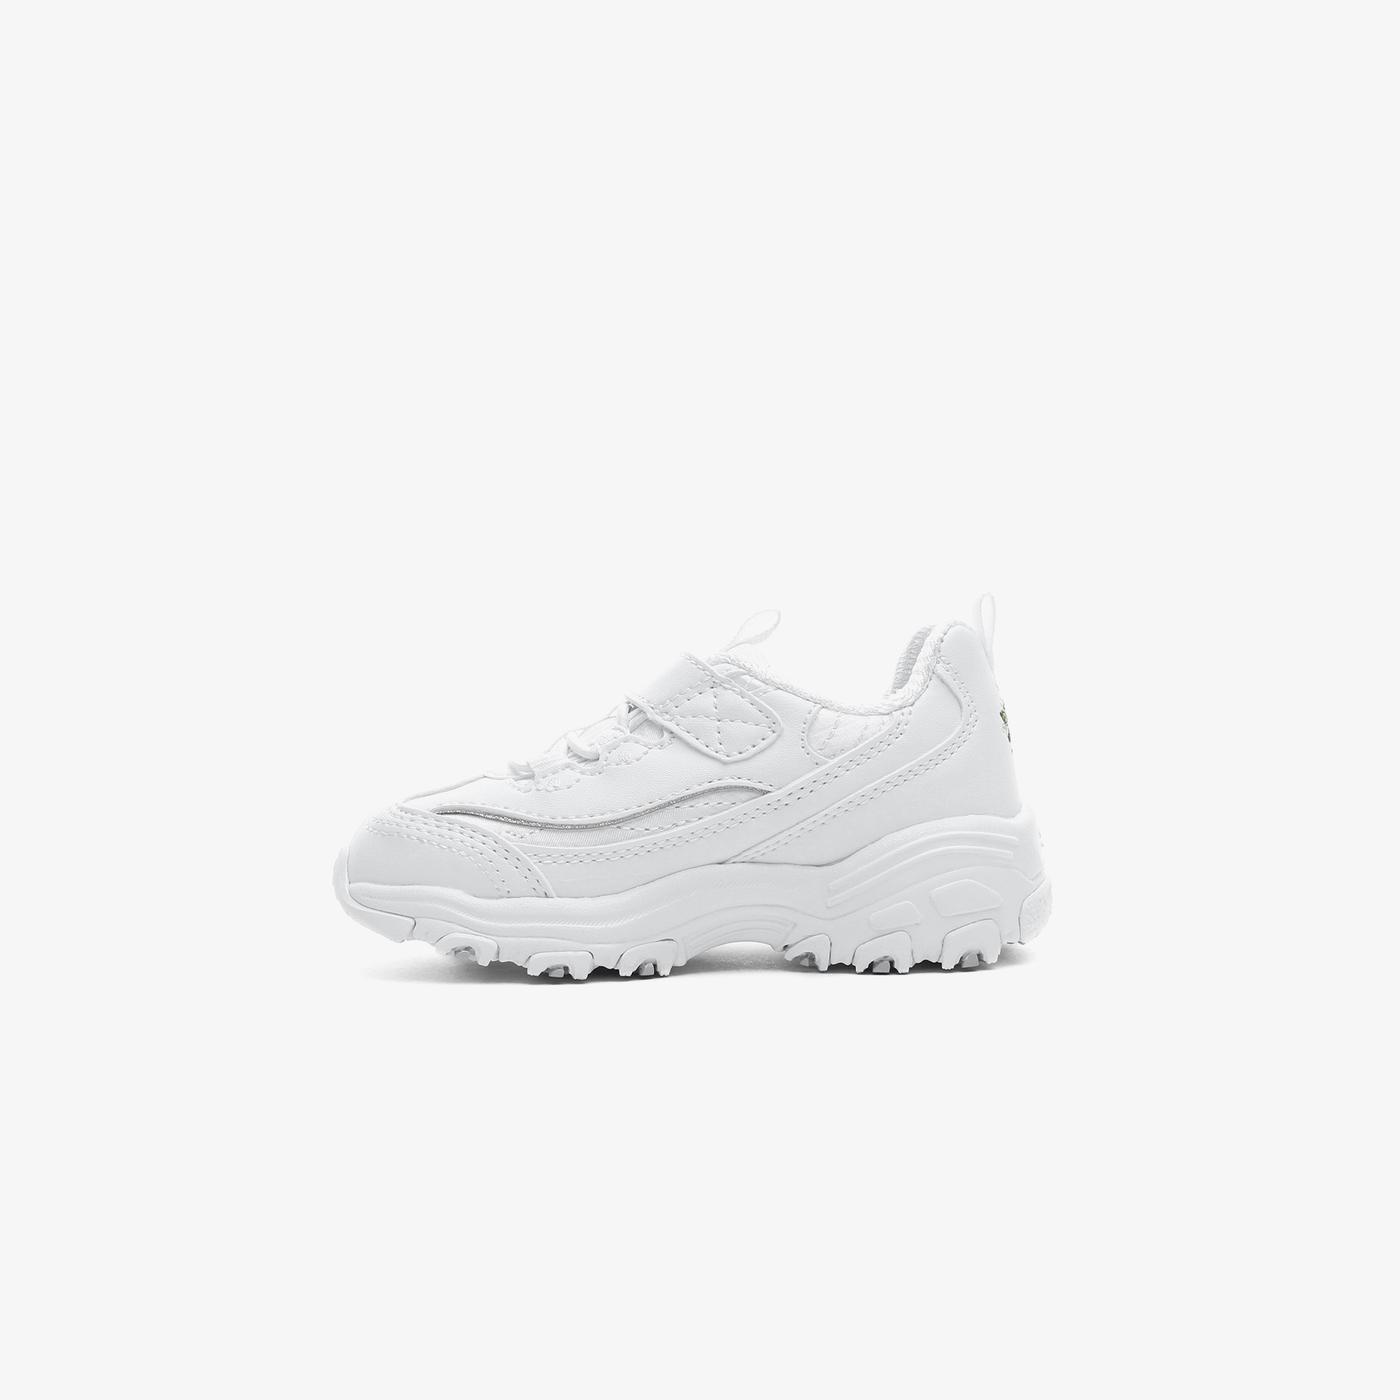 Skechers D'Lites - Lil Blossom Bebek Beyaz Spor Ayakkabı